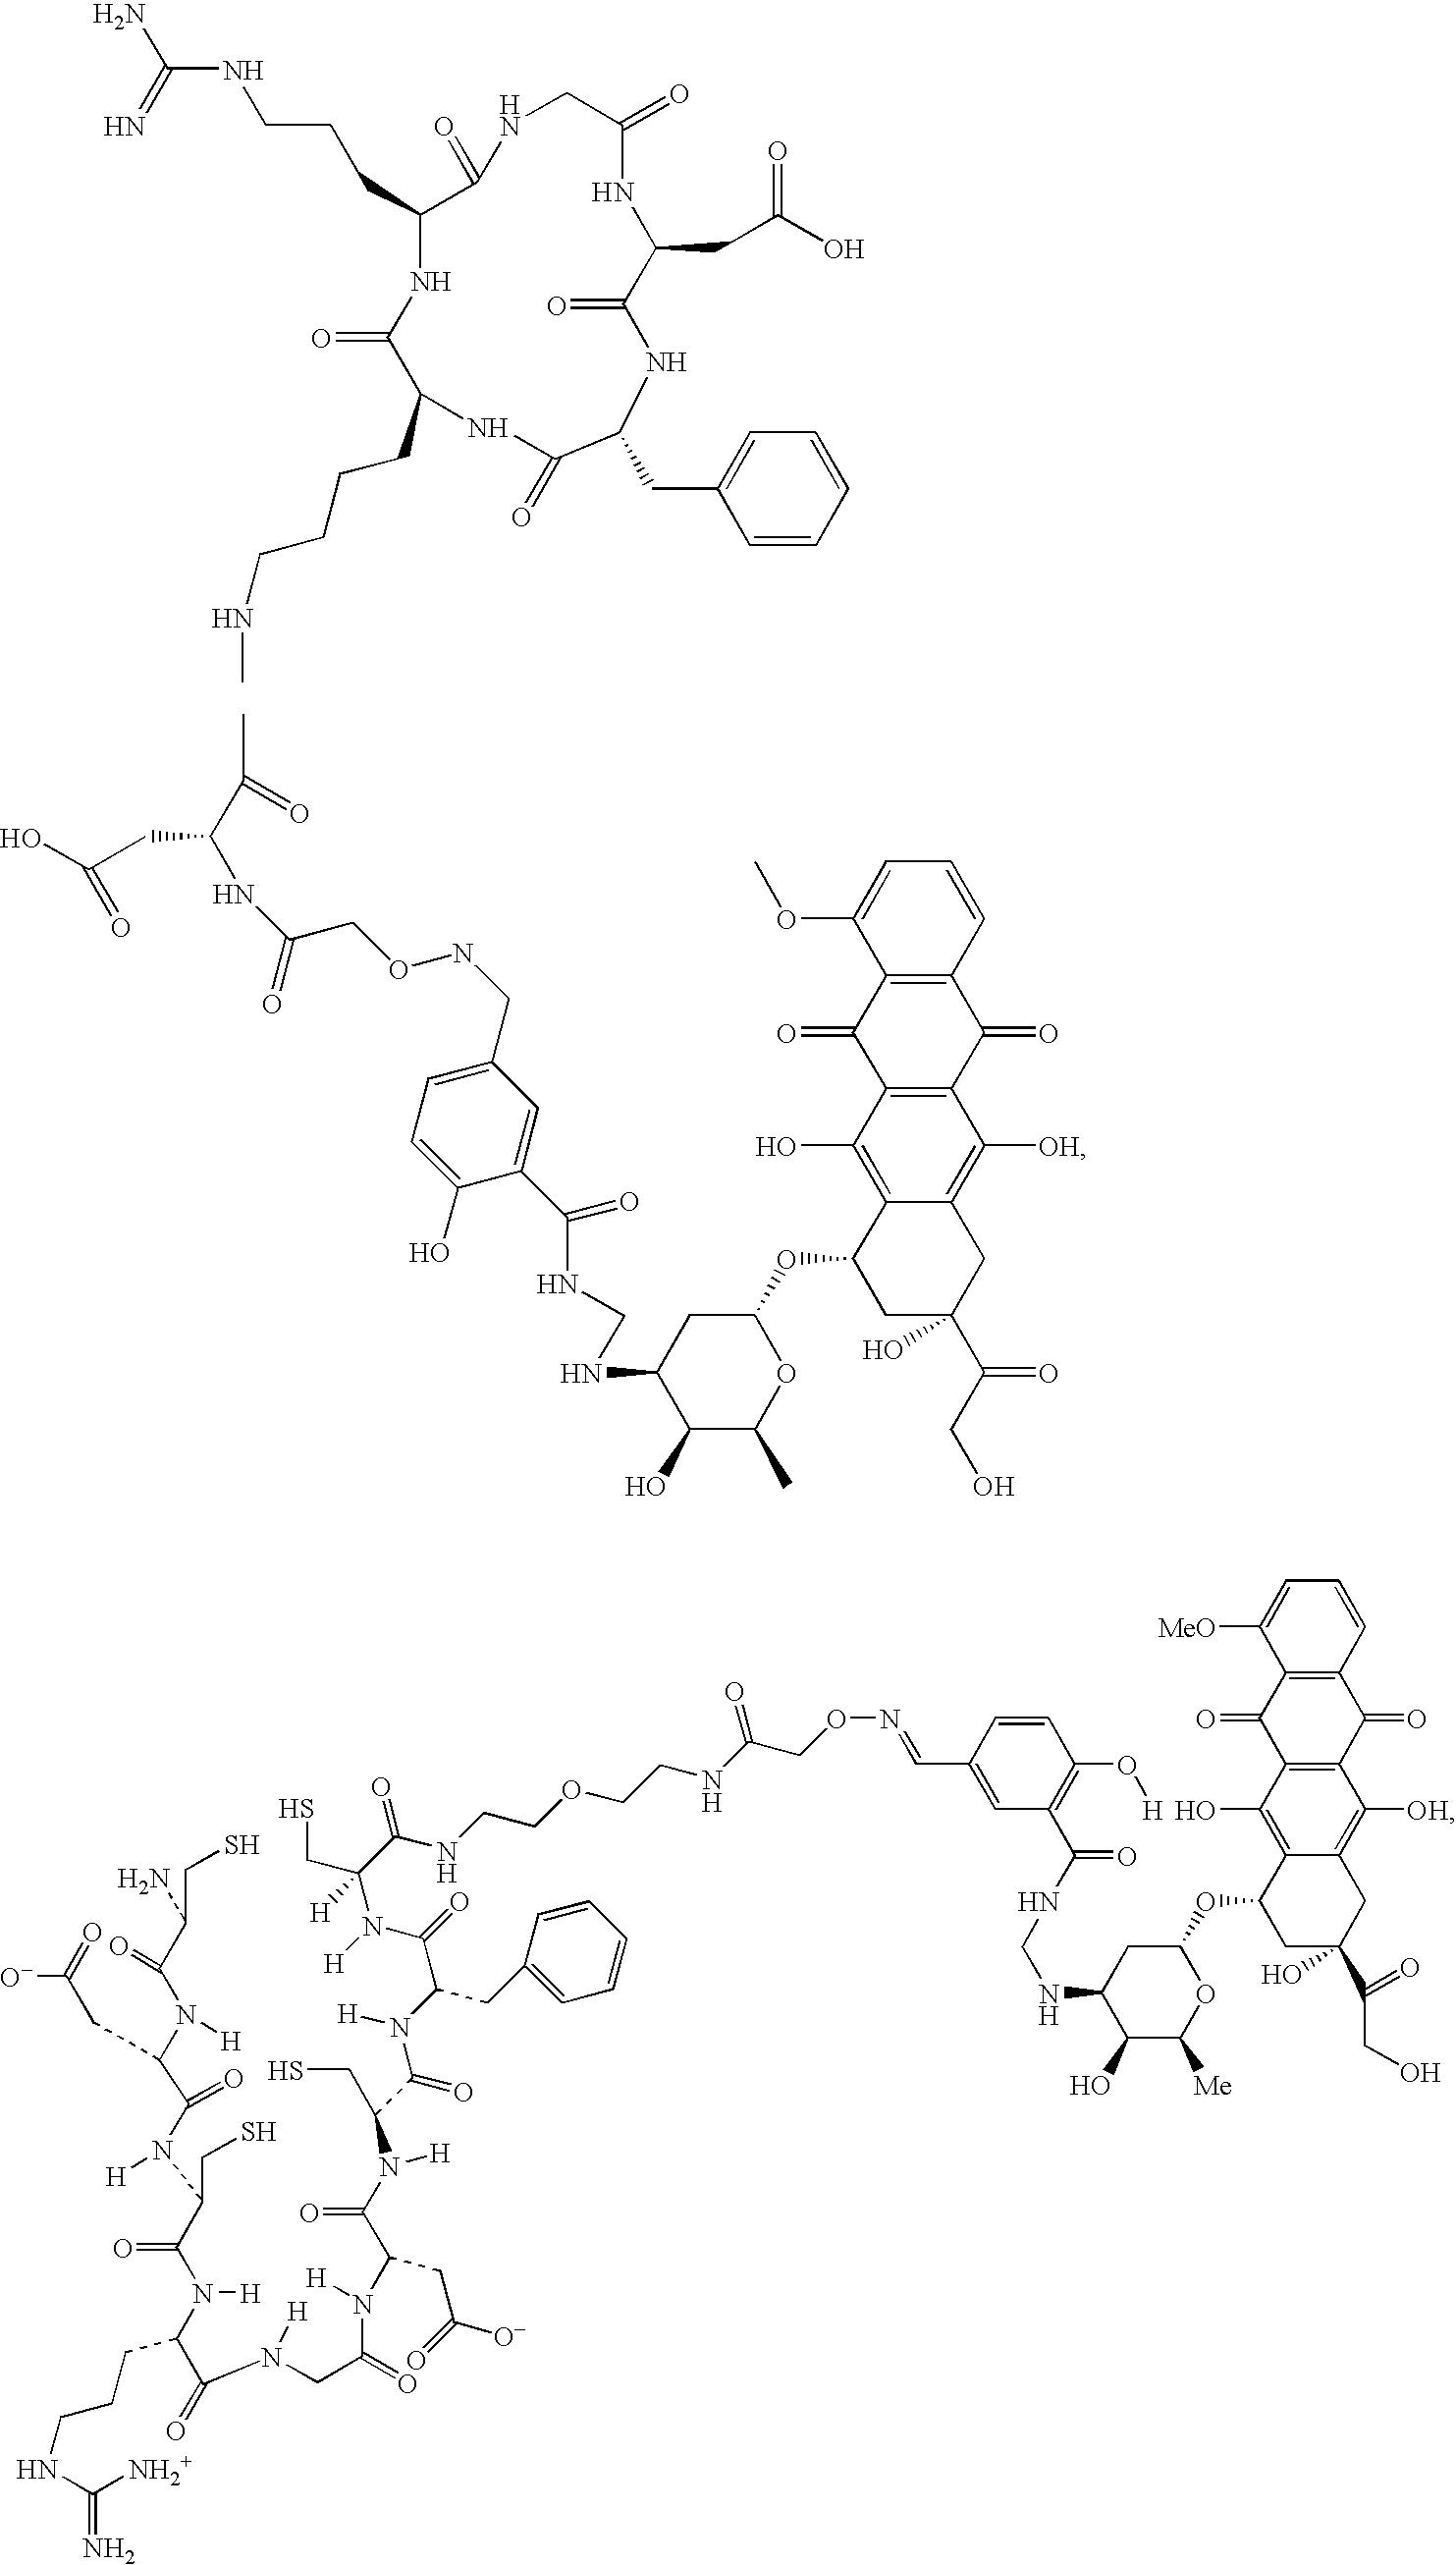 Ciprofloxacin Dosage Guide with Precautions - m